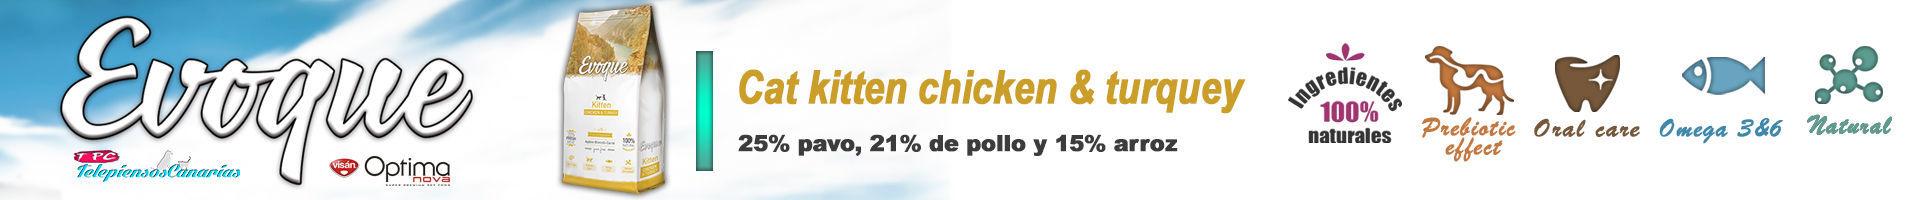 Evoque cat kitten chicken and turquey, nutrición con carne fresca